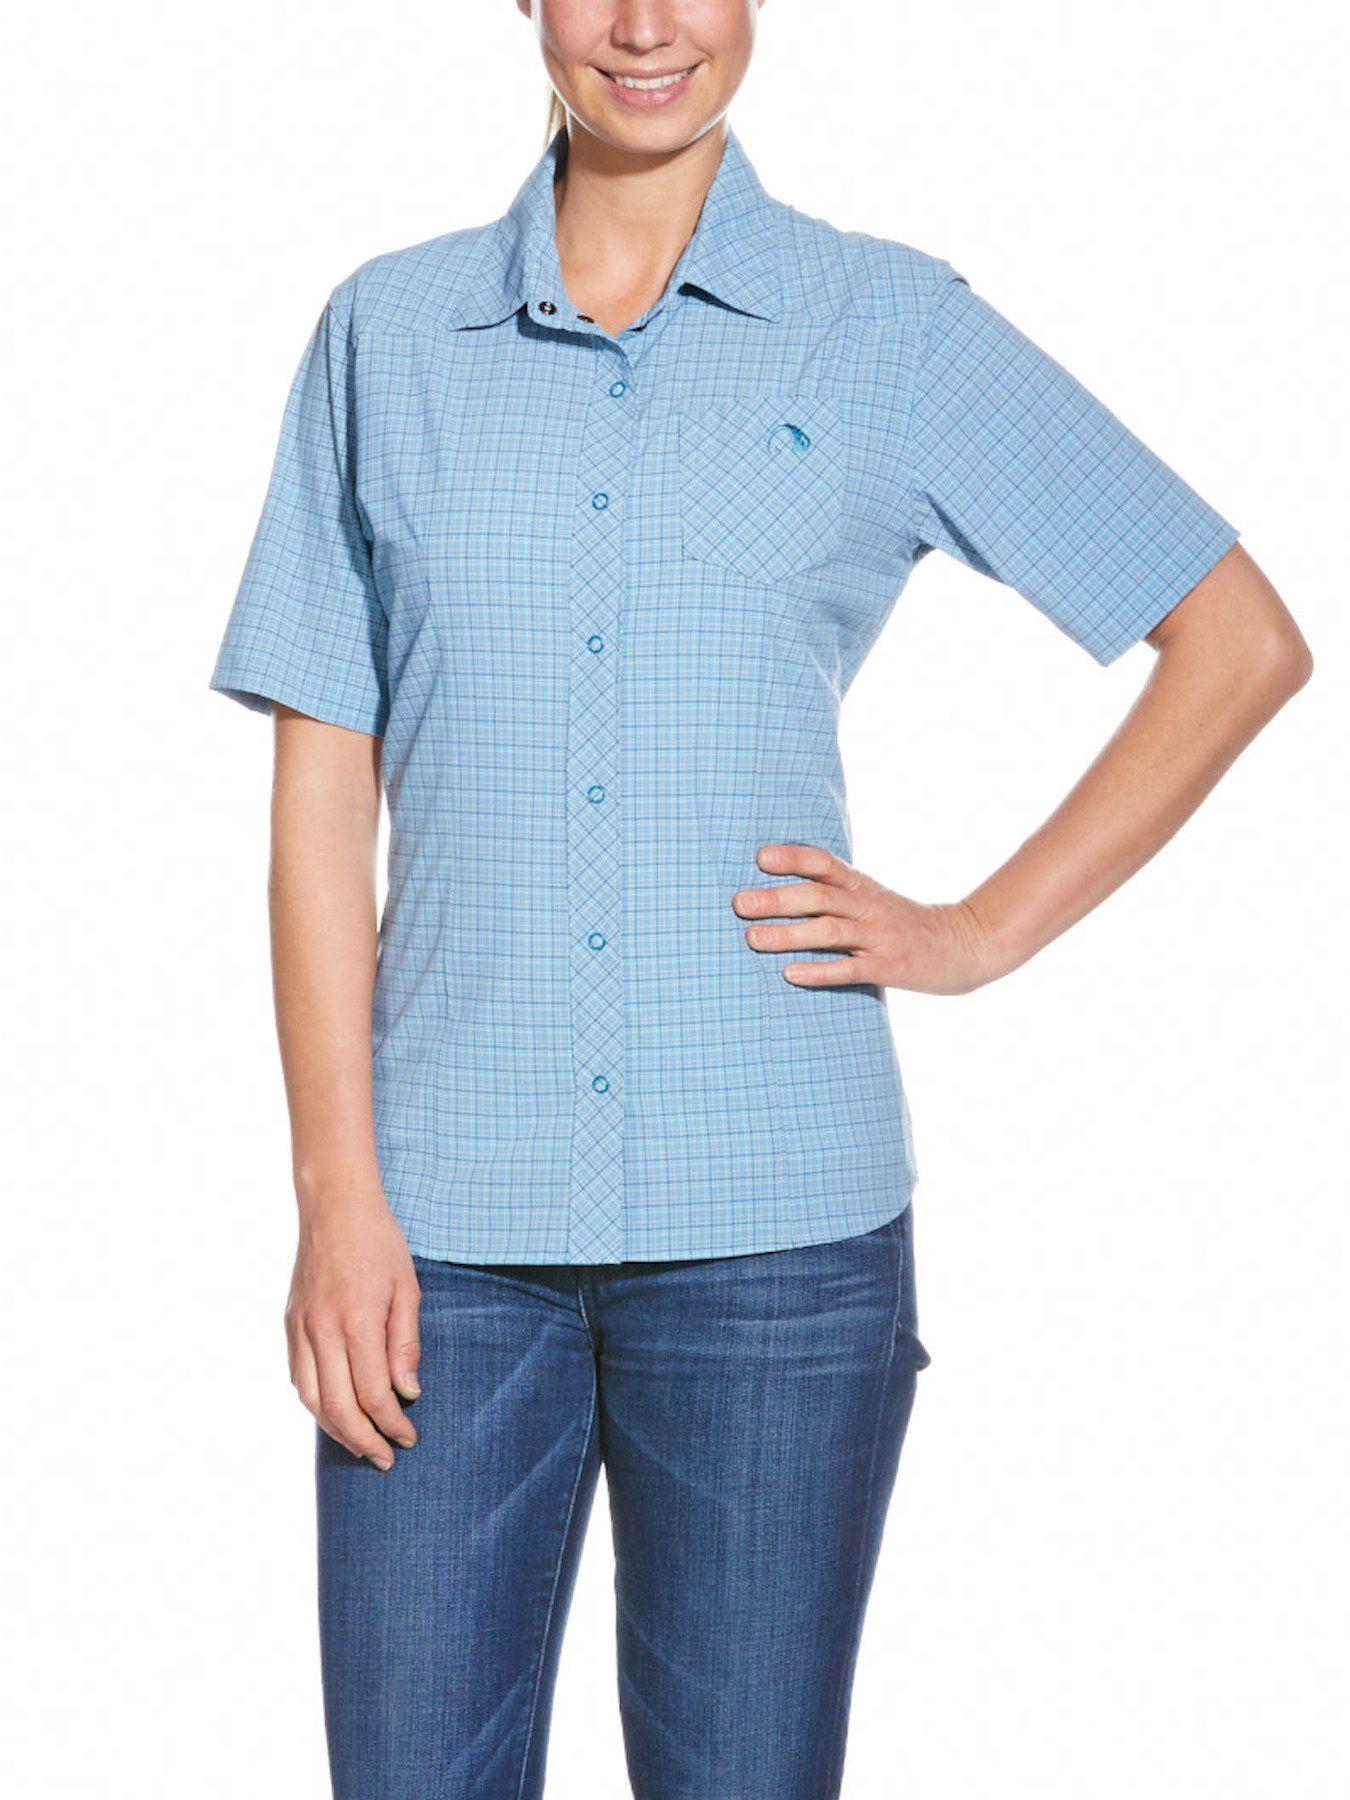 Tatonka Jonne W''s koszulka damska niebieski niebieski (Sea Blue) 36